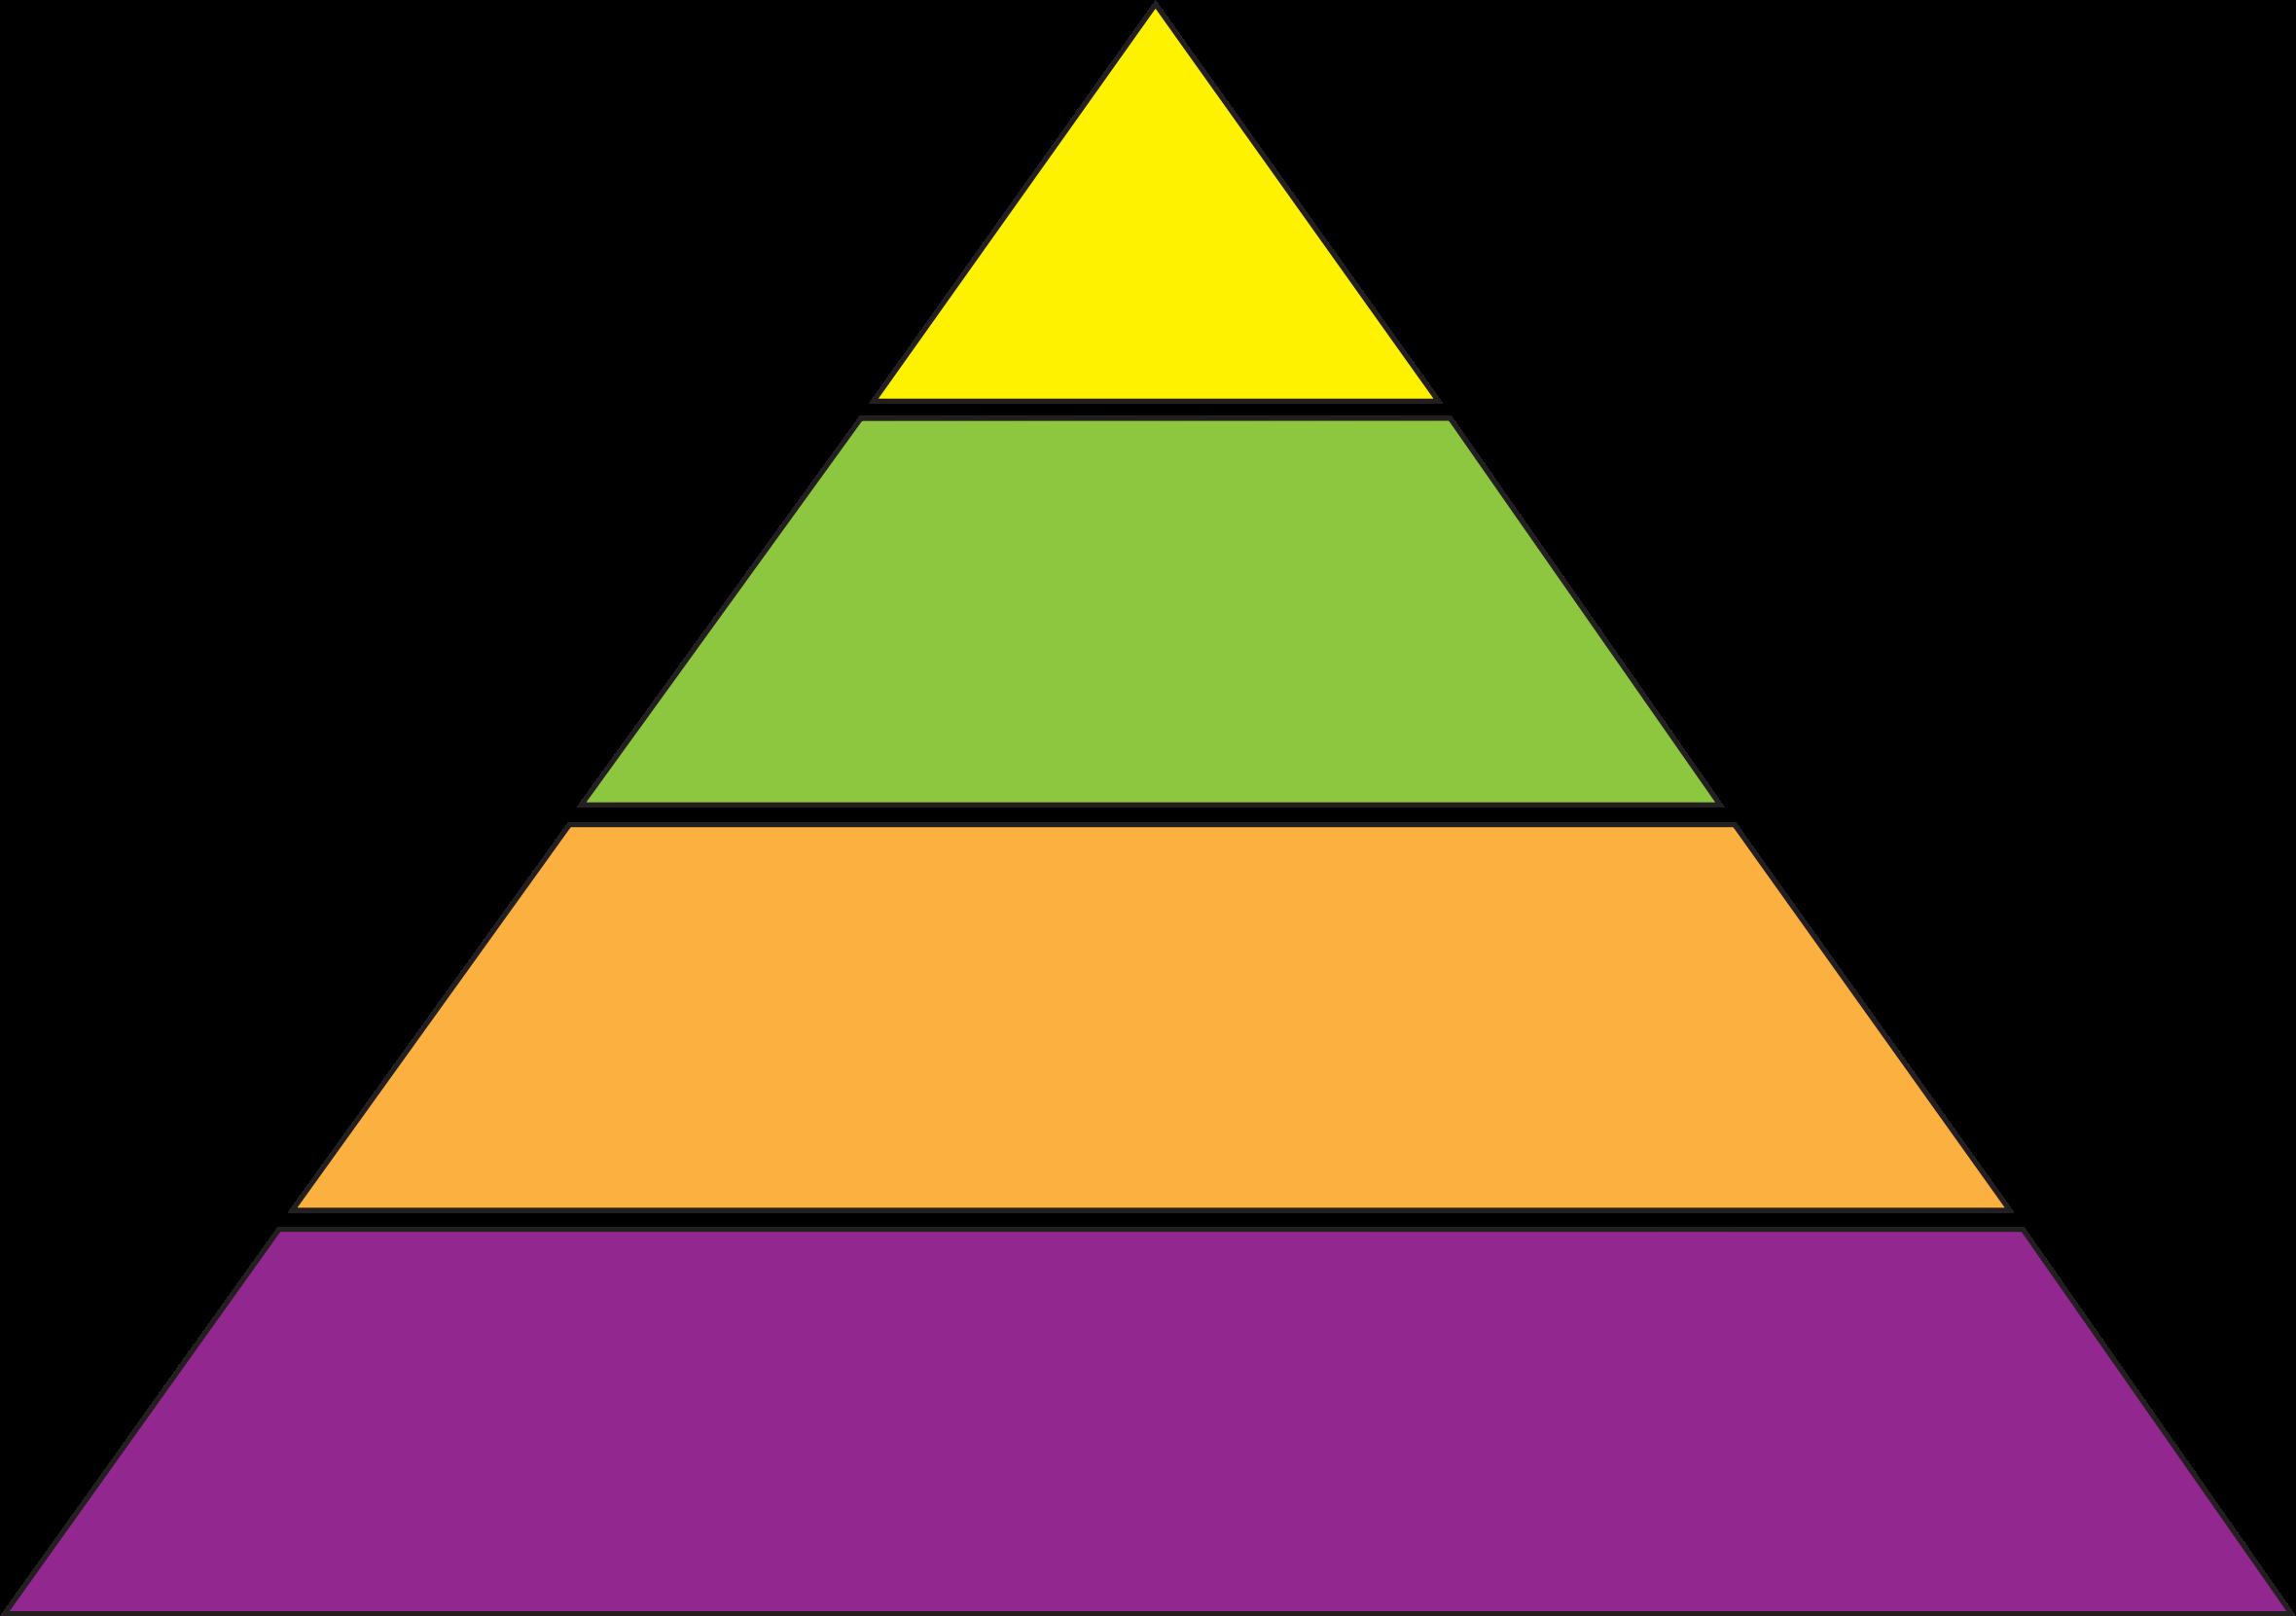 Triangular clipart pyramid. Can do the blog